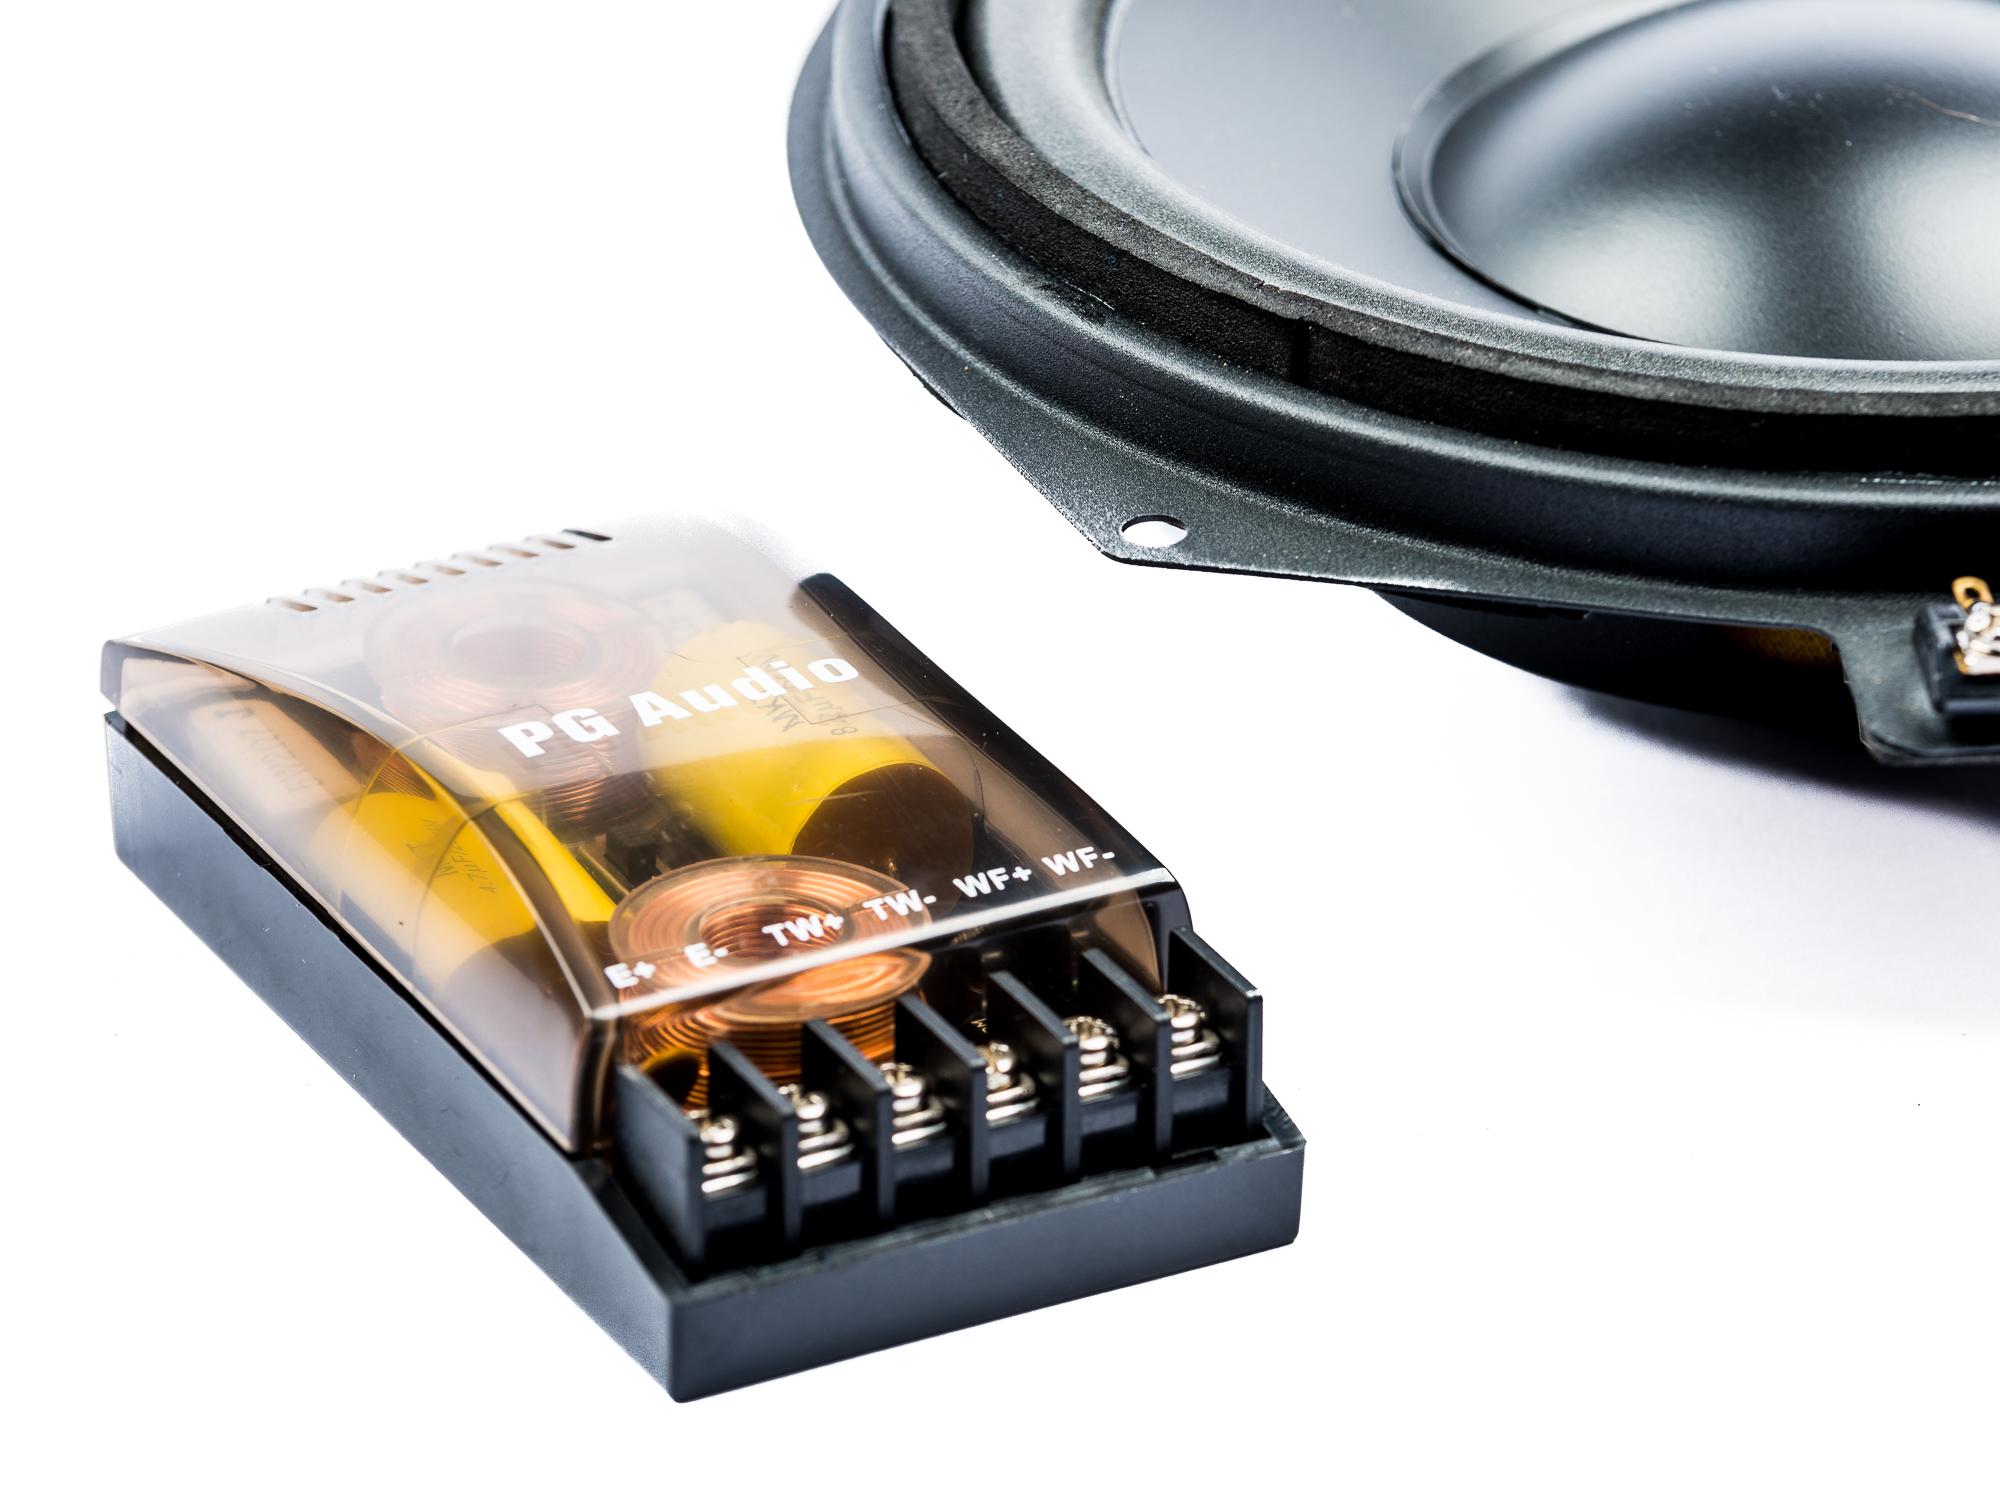 1 Set  PG Audio BM 8 SET, BMW Lautsprecher  20 cm  B-WARE – Bild 4